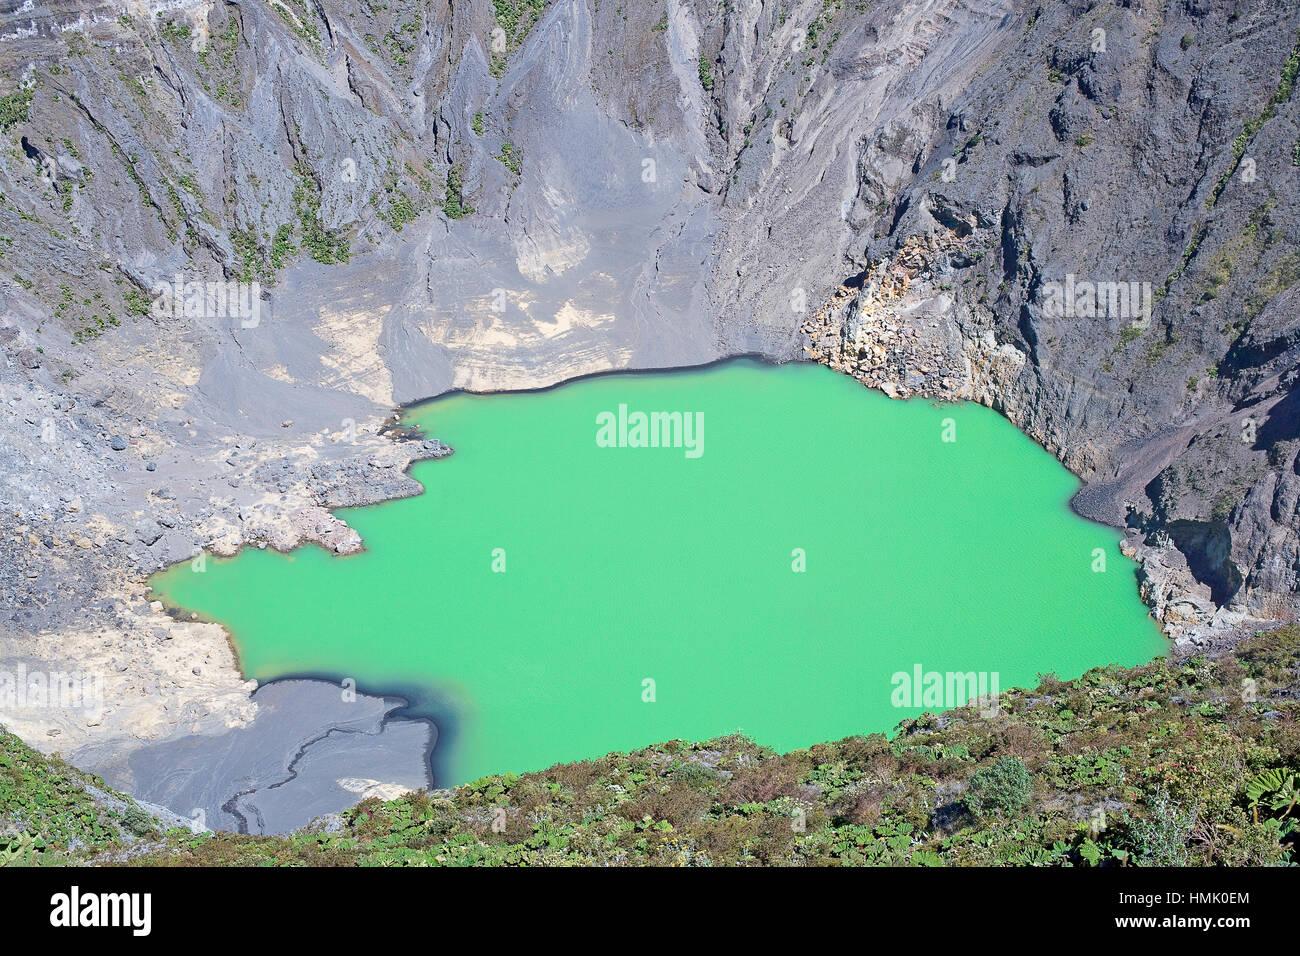 Caldera with green crater lake, Irazu volcano, Irazu volcano National Park, Cartago Province, Costa Rica Stock Photo